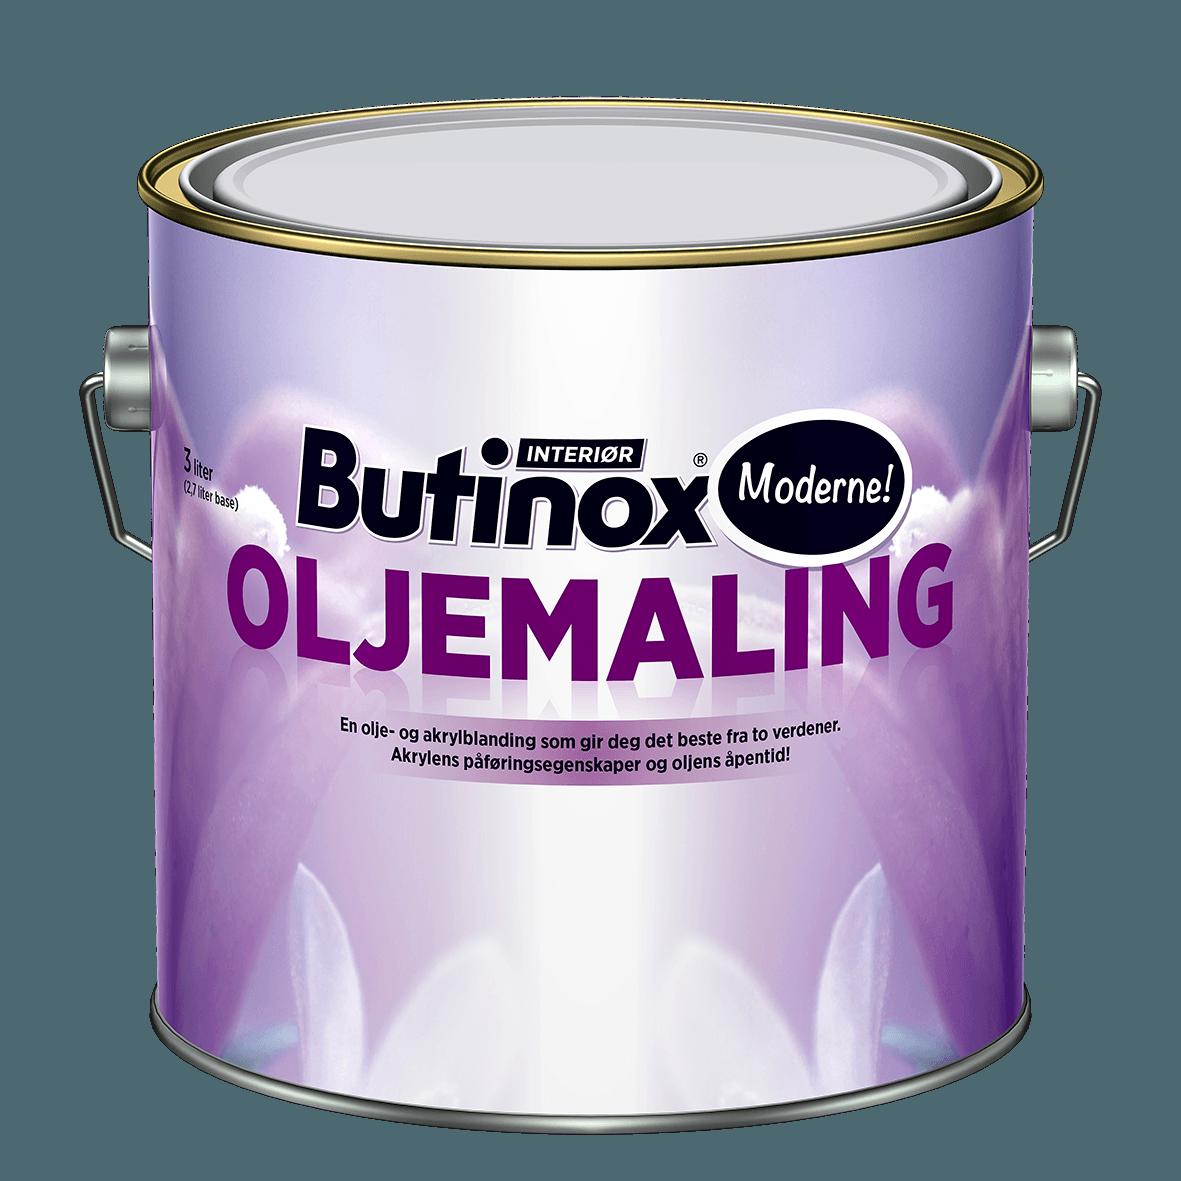 3L_Butinox_Oljemaling_Moderne_Lavopploest